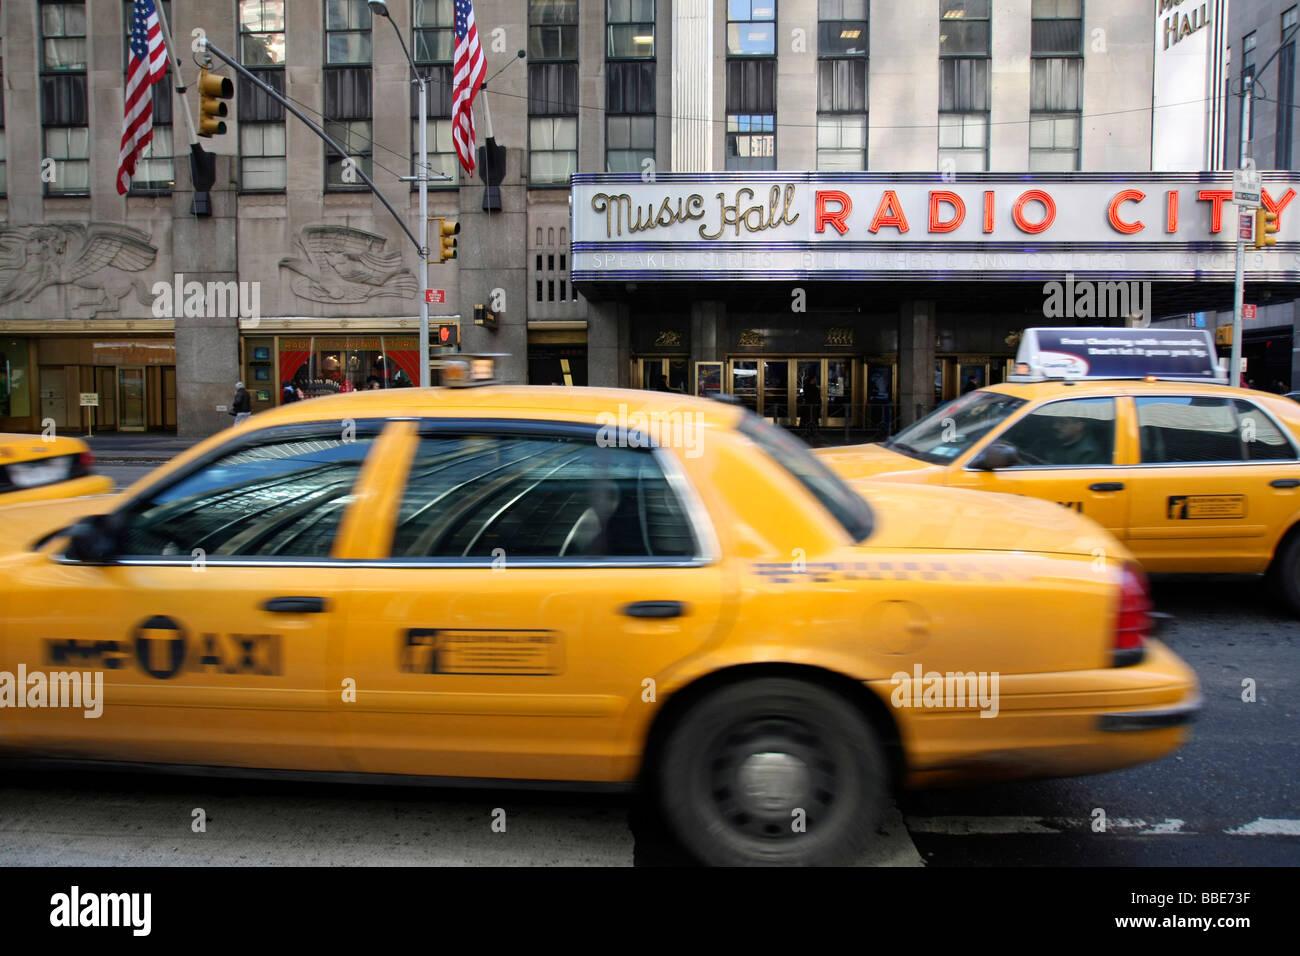 Radio City Music Hall, Midtown, Manhattan, New York City, USA, United States of America - Stock Image